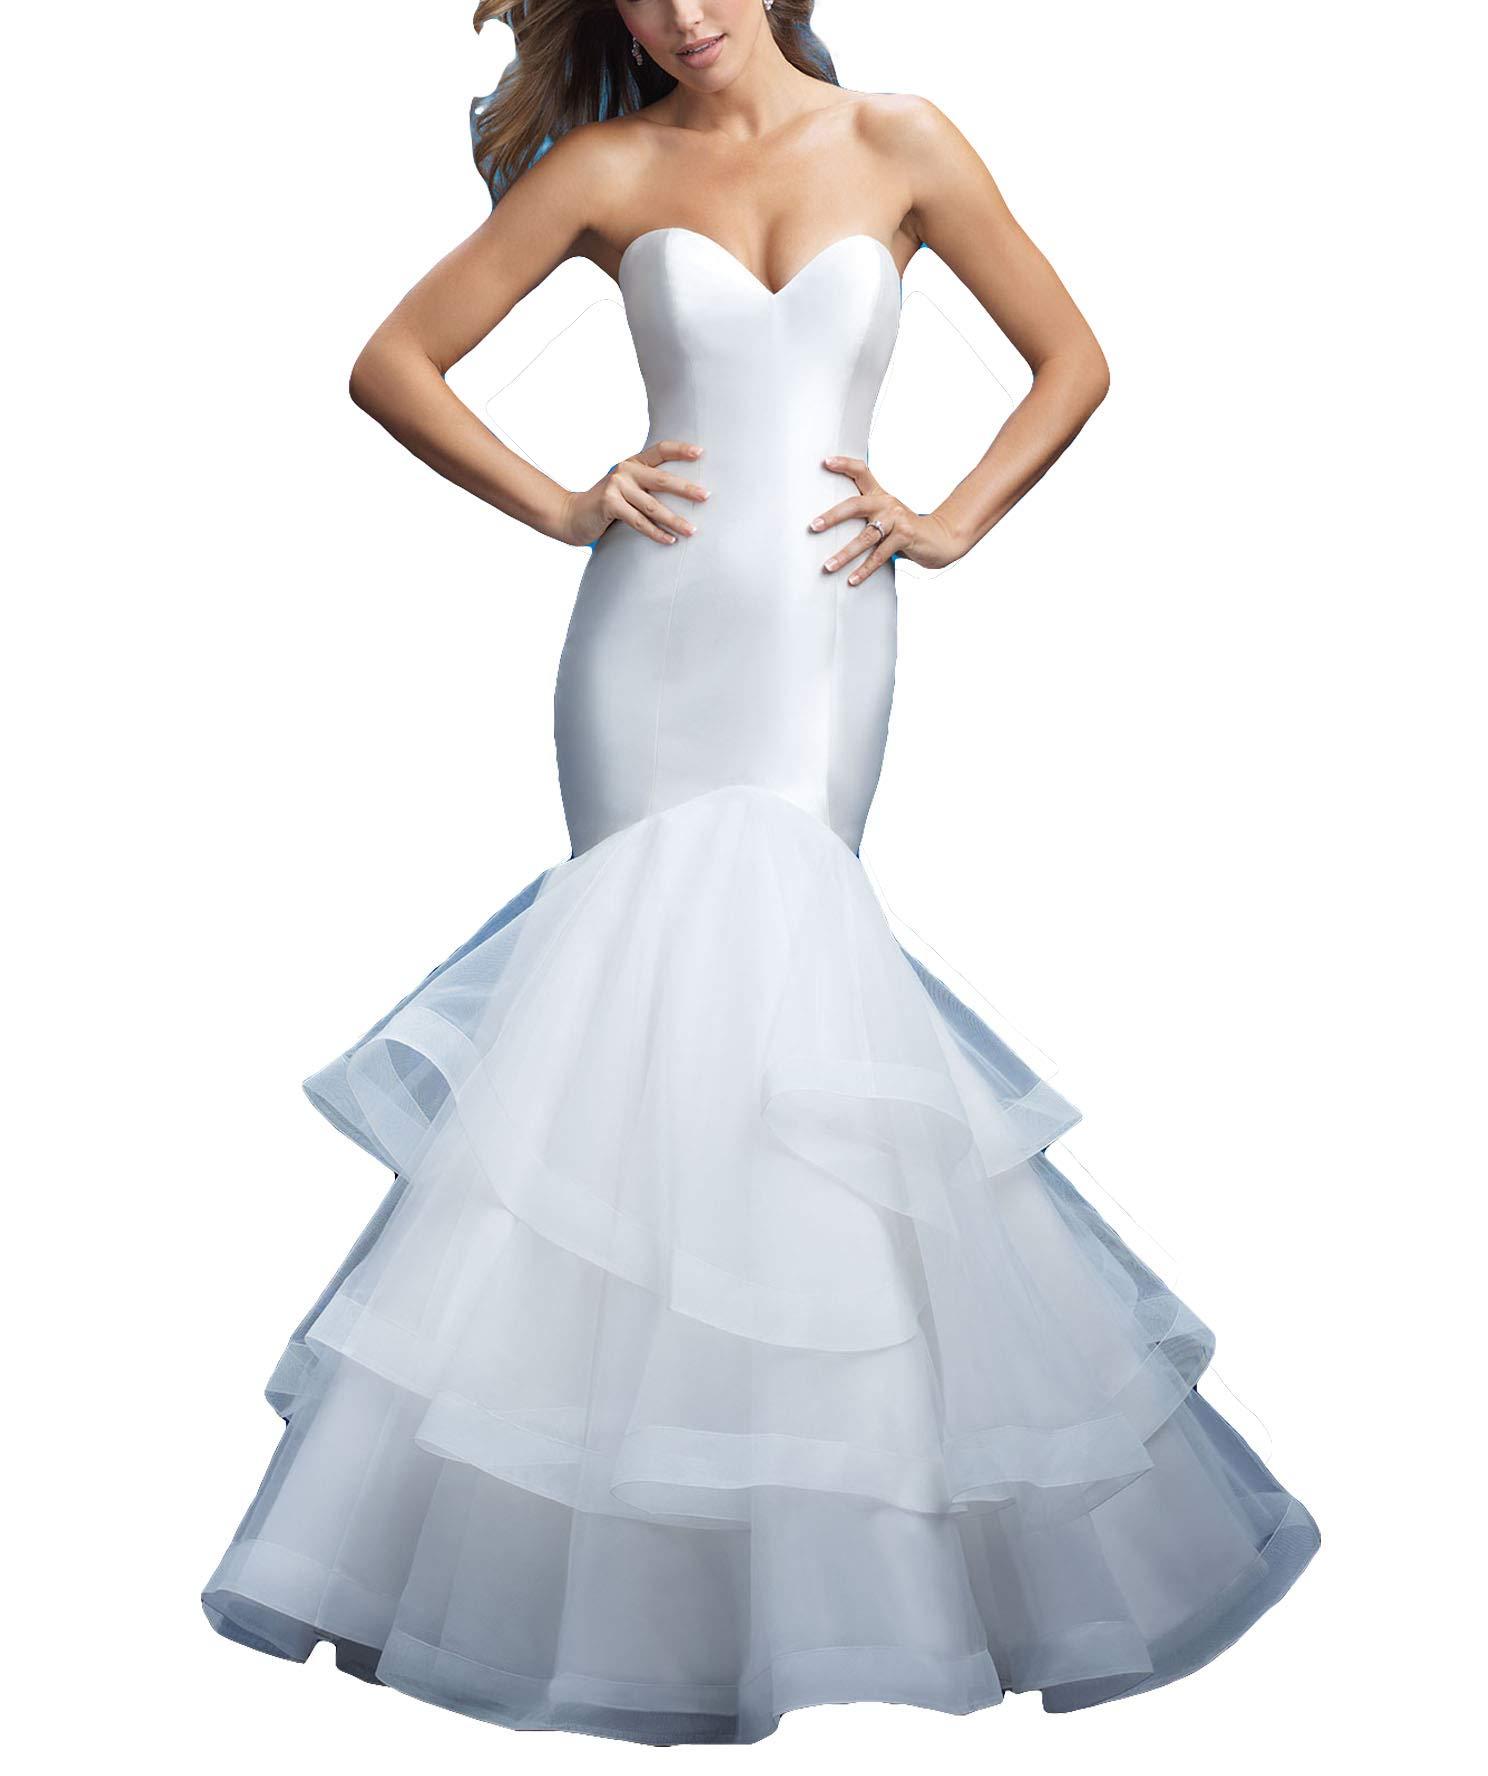 Fenghuavip V-Neck Slim Wedding Dress Long Train Satin Wedding Gowns Brides